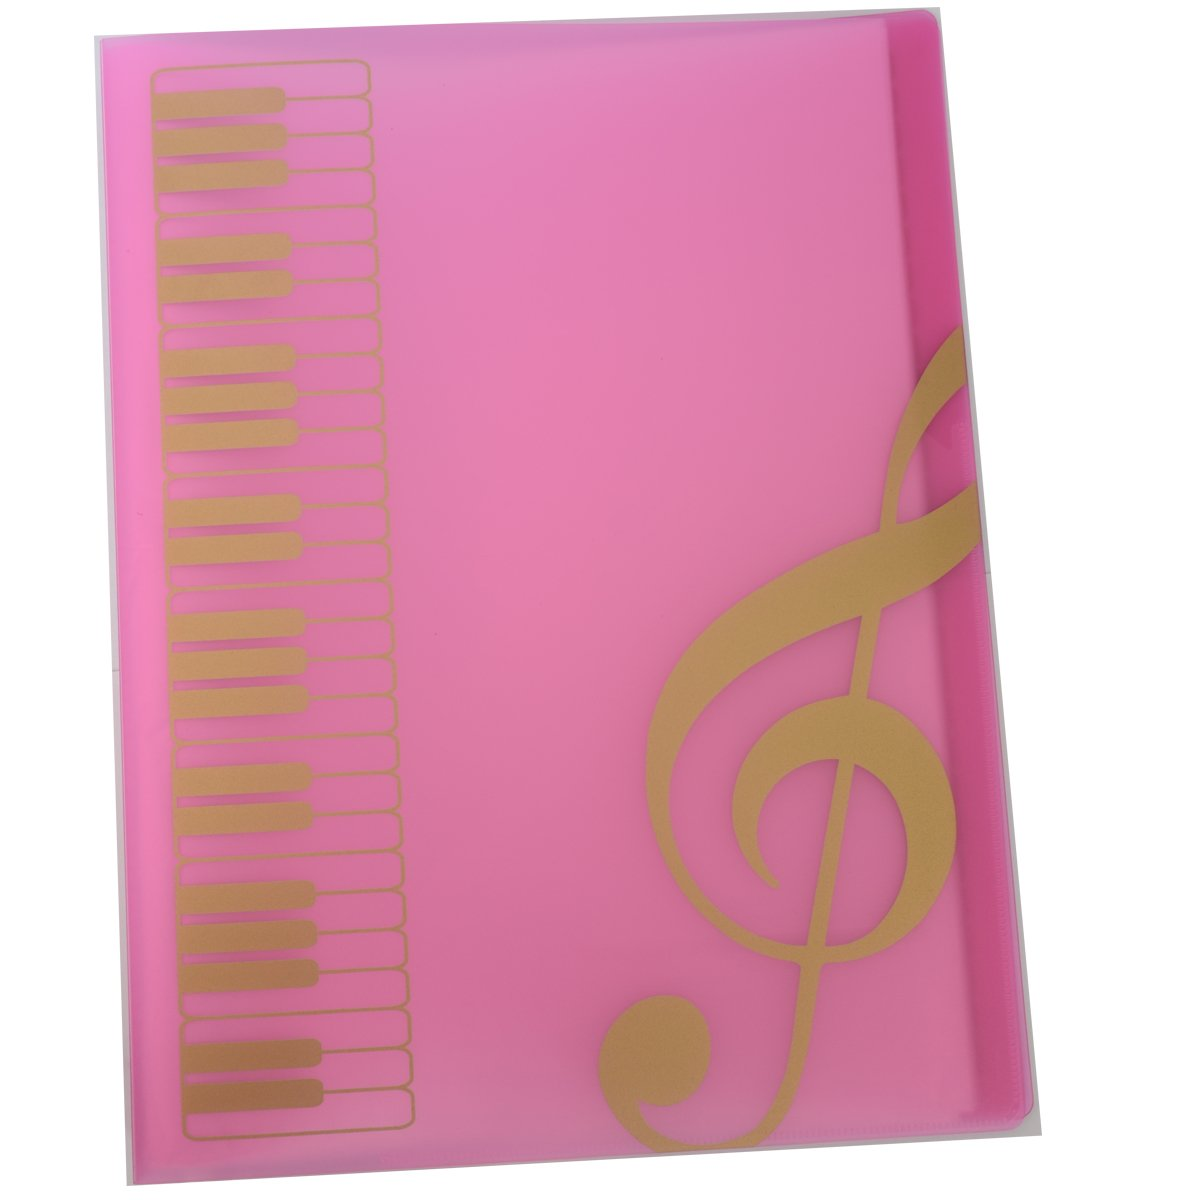 Music Themed Folder Music folder storage Holder,A4 Size Folder,40 Pockets,Treble Clef Folder (Lucency) Sound harbor Music Folder MG-43